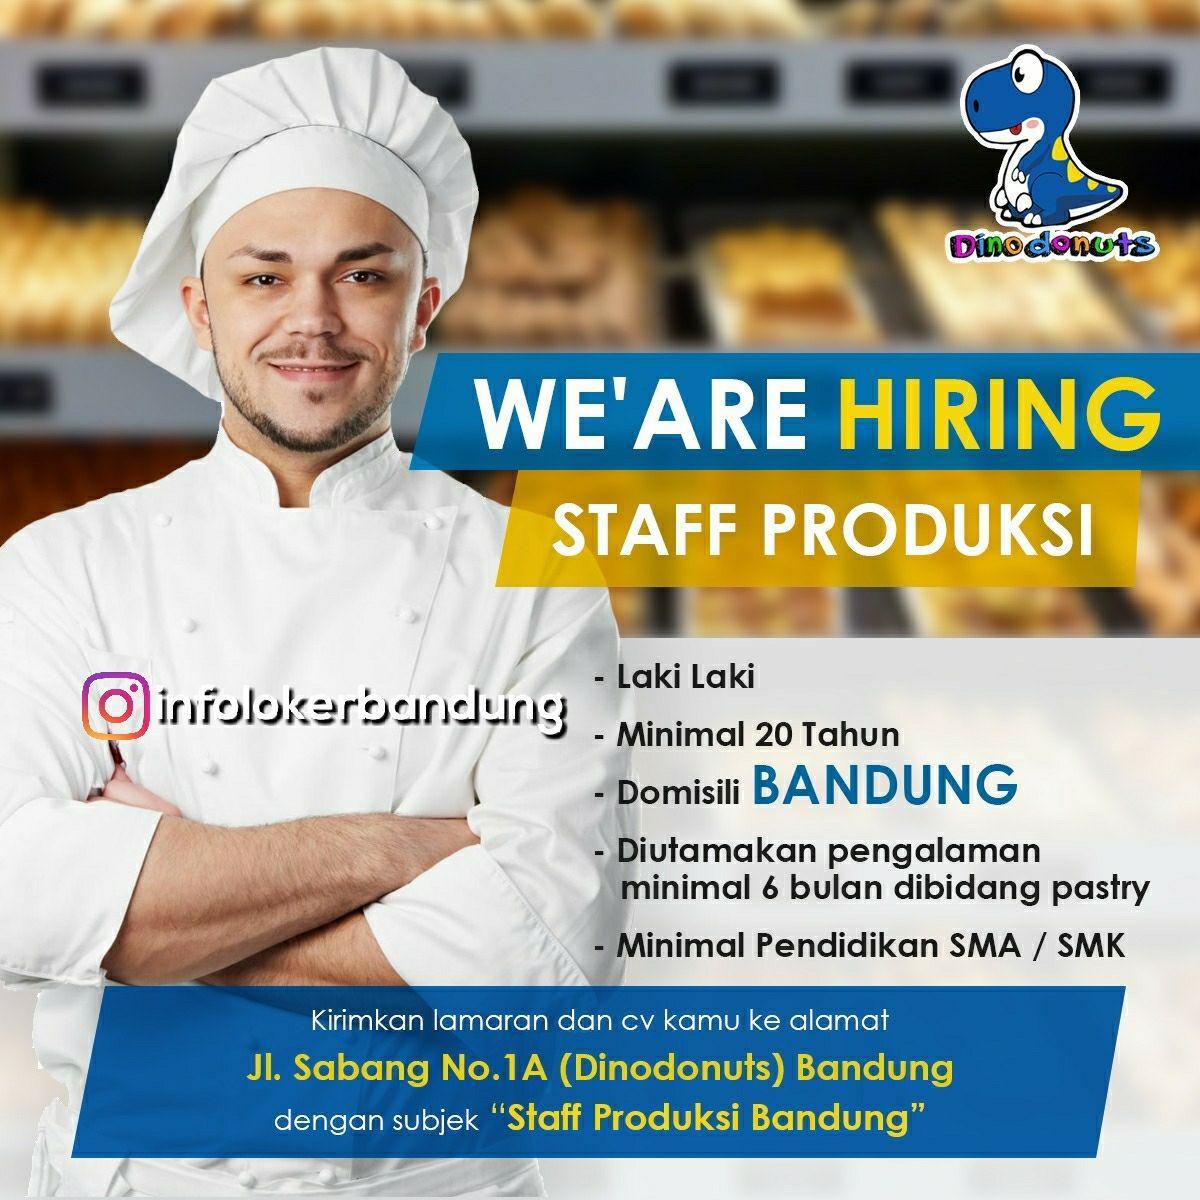 Lowongan Kerja Dino Donuts Bandung Januari 2018